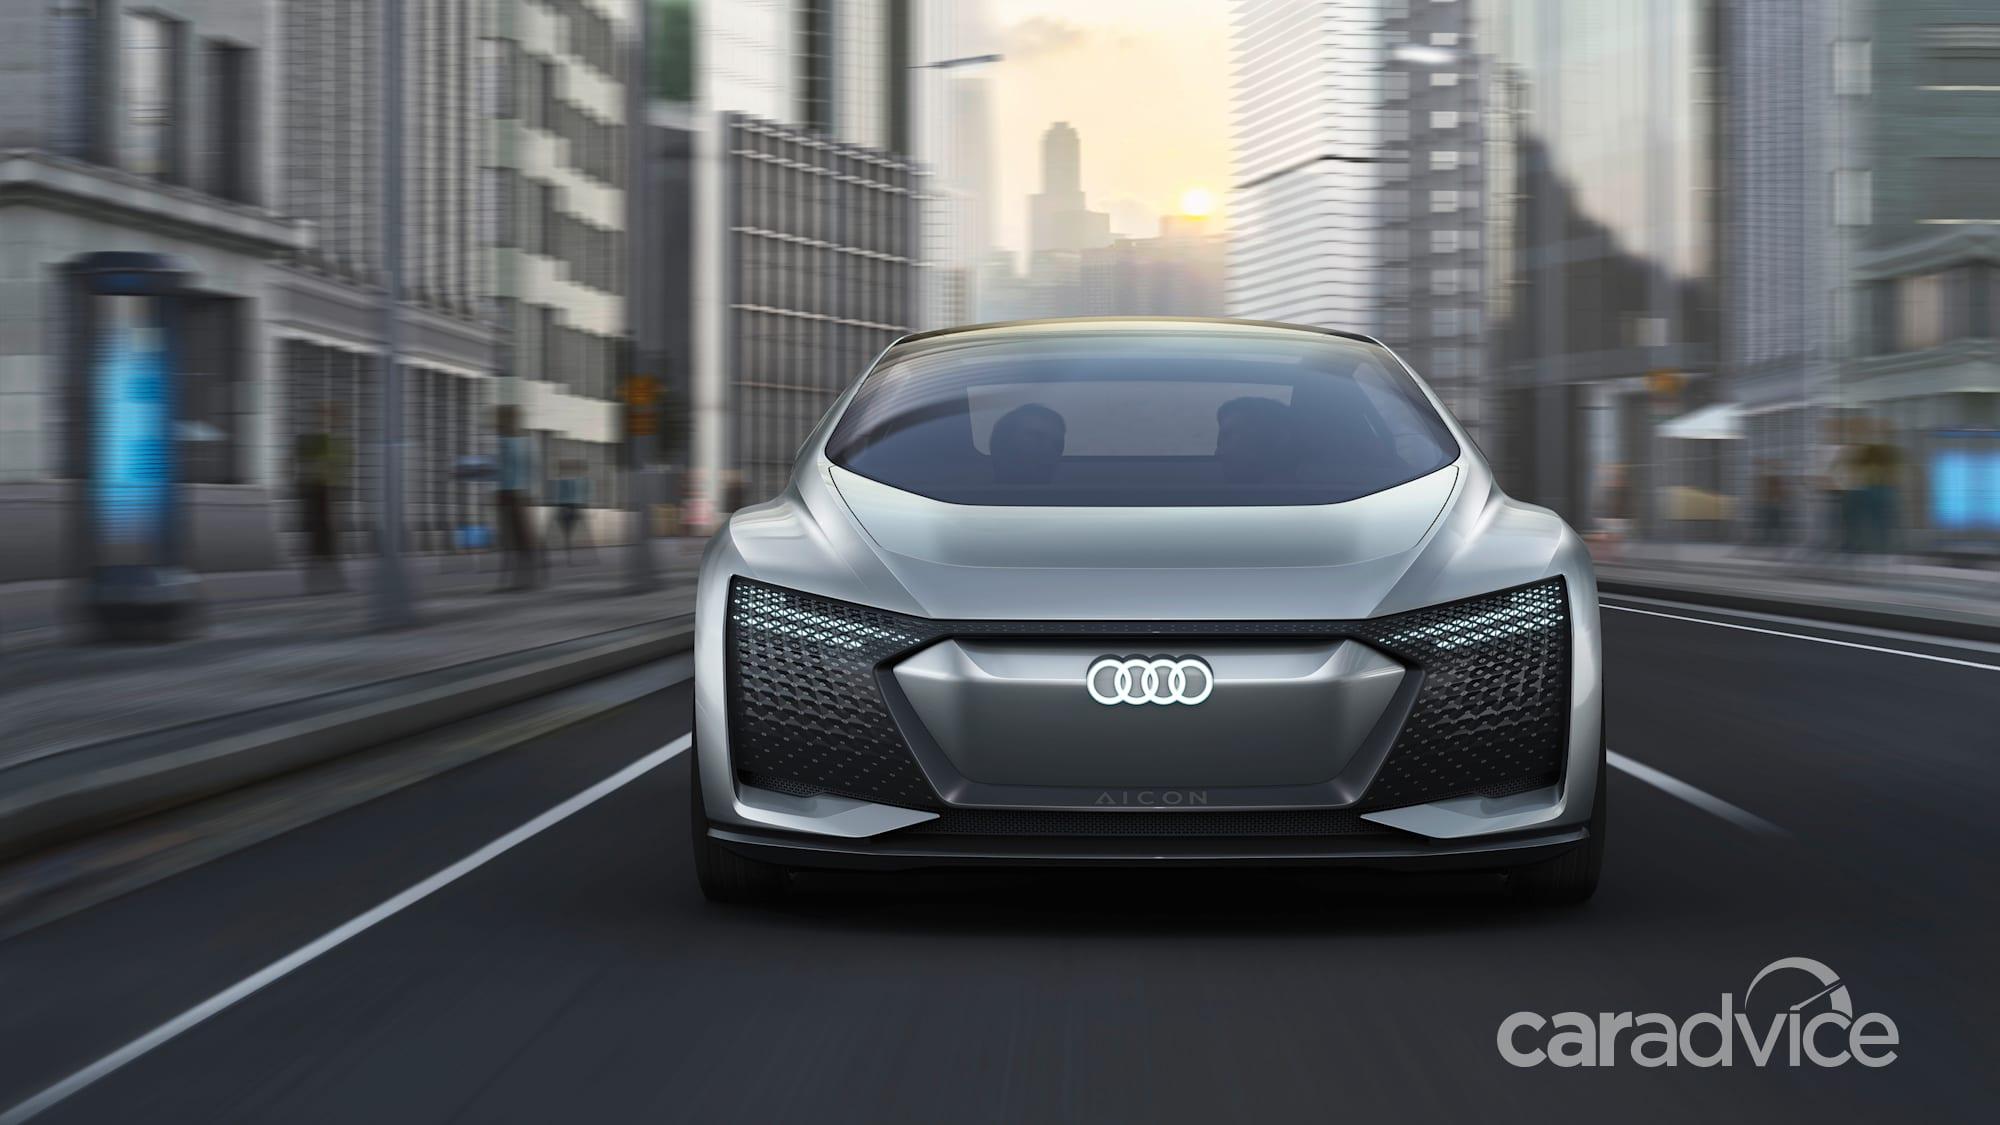 audi elaine and aicon: level 4 and 5 autonomous vehicles